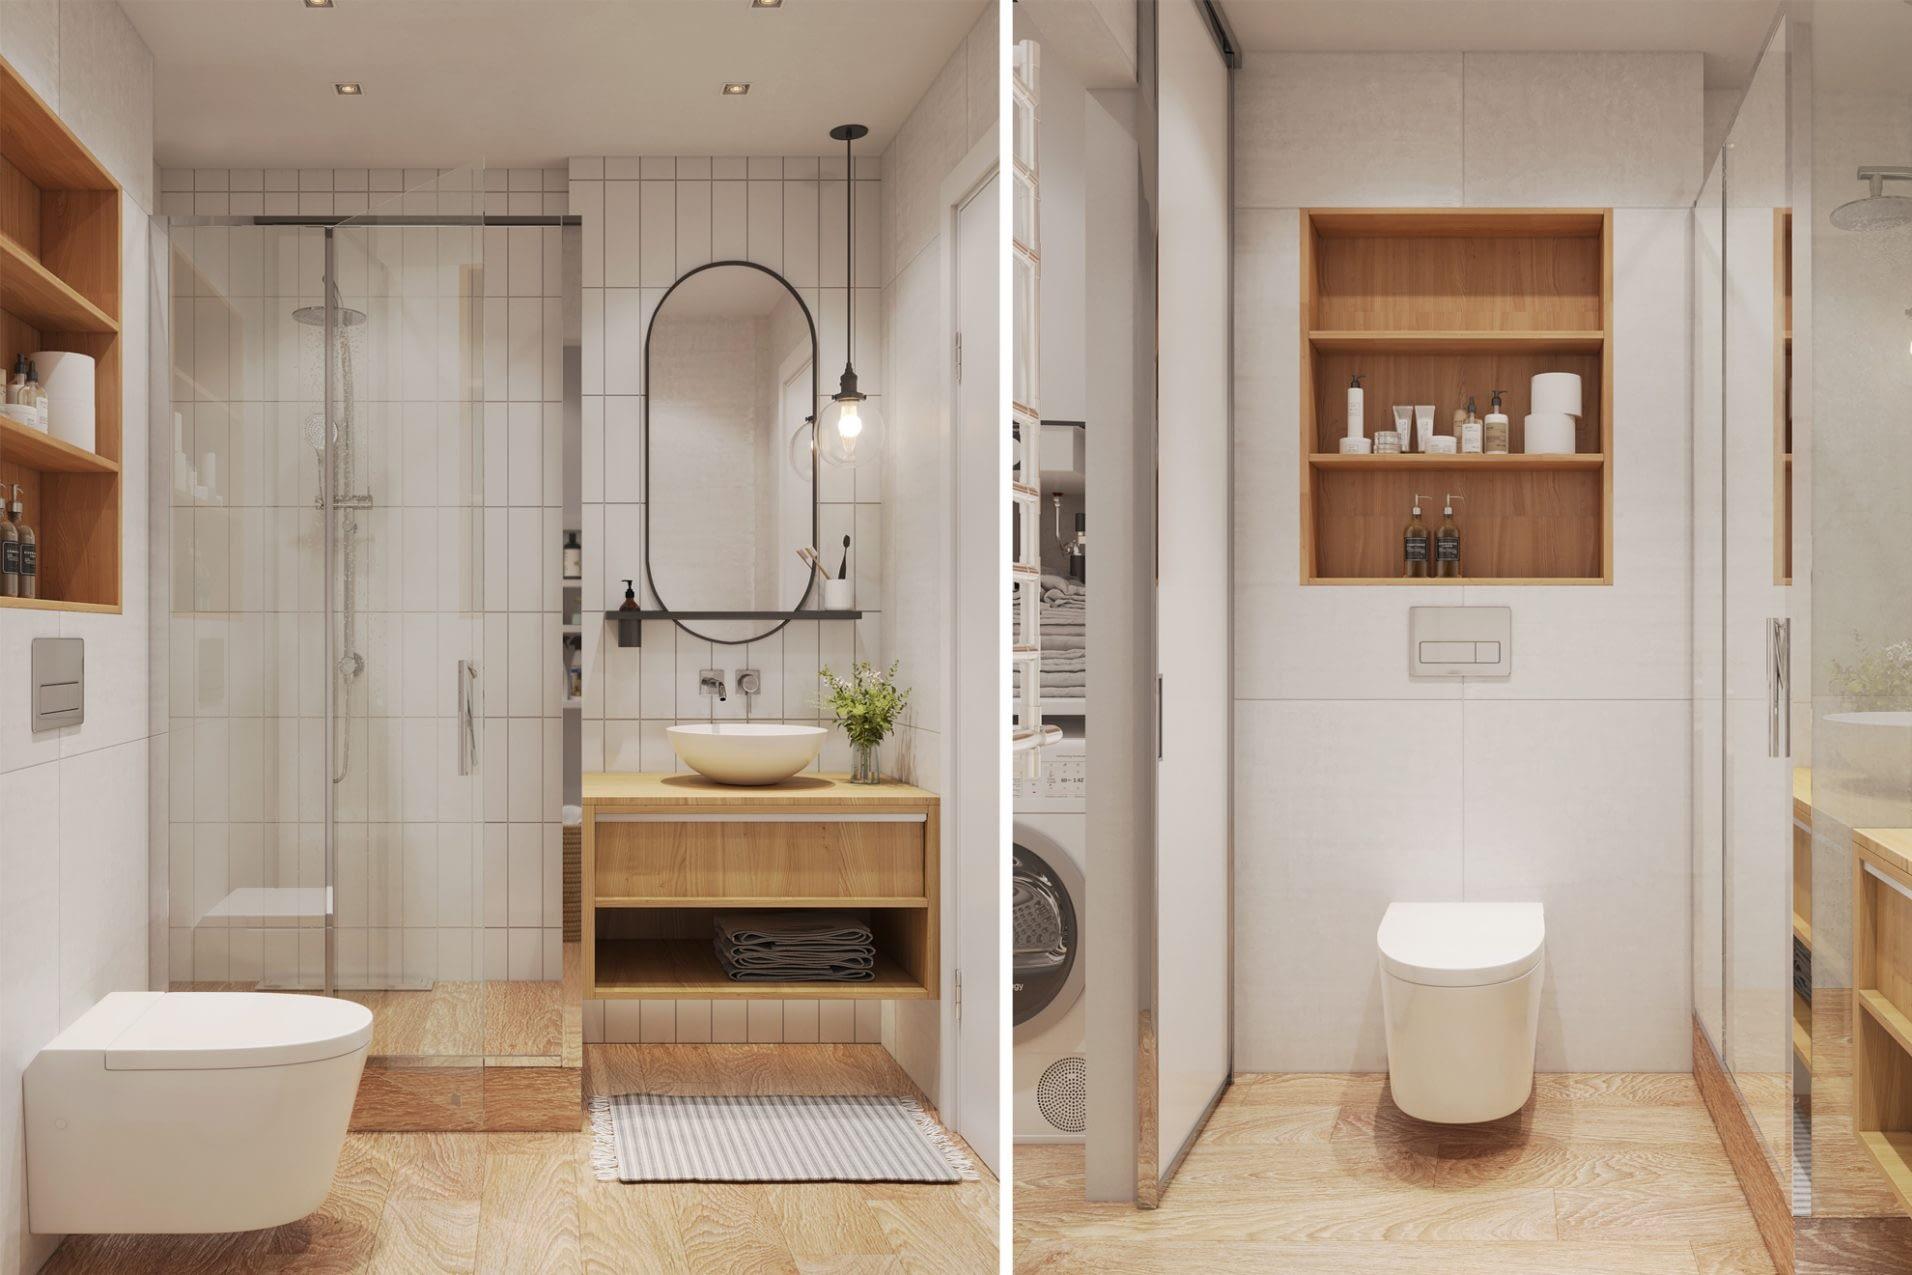 дизайн проект интерьера ванной комнаты квартиры от Lavrov Design